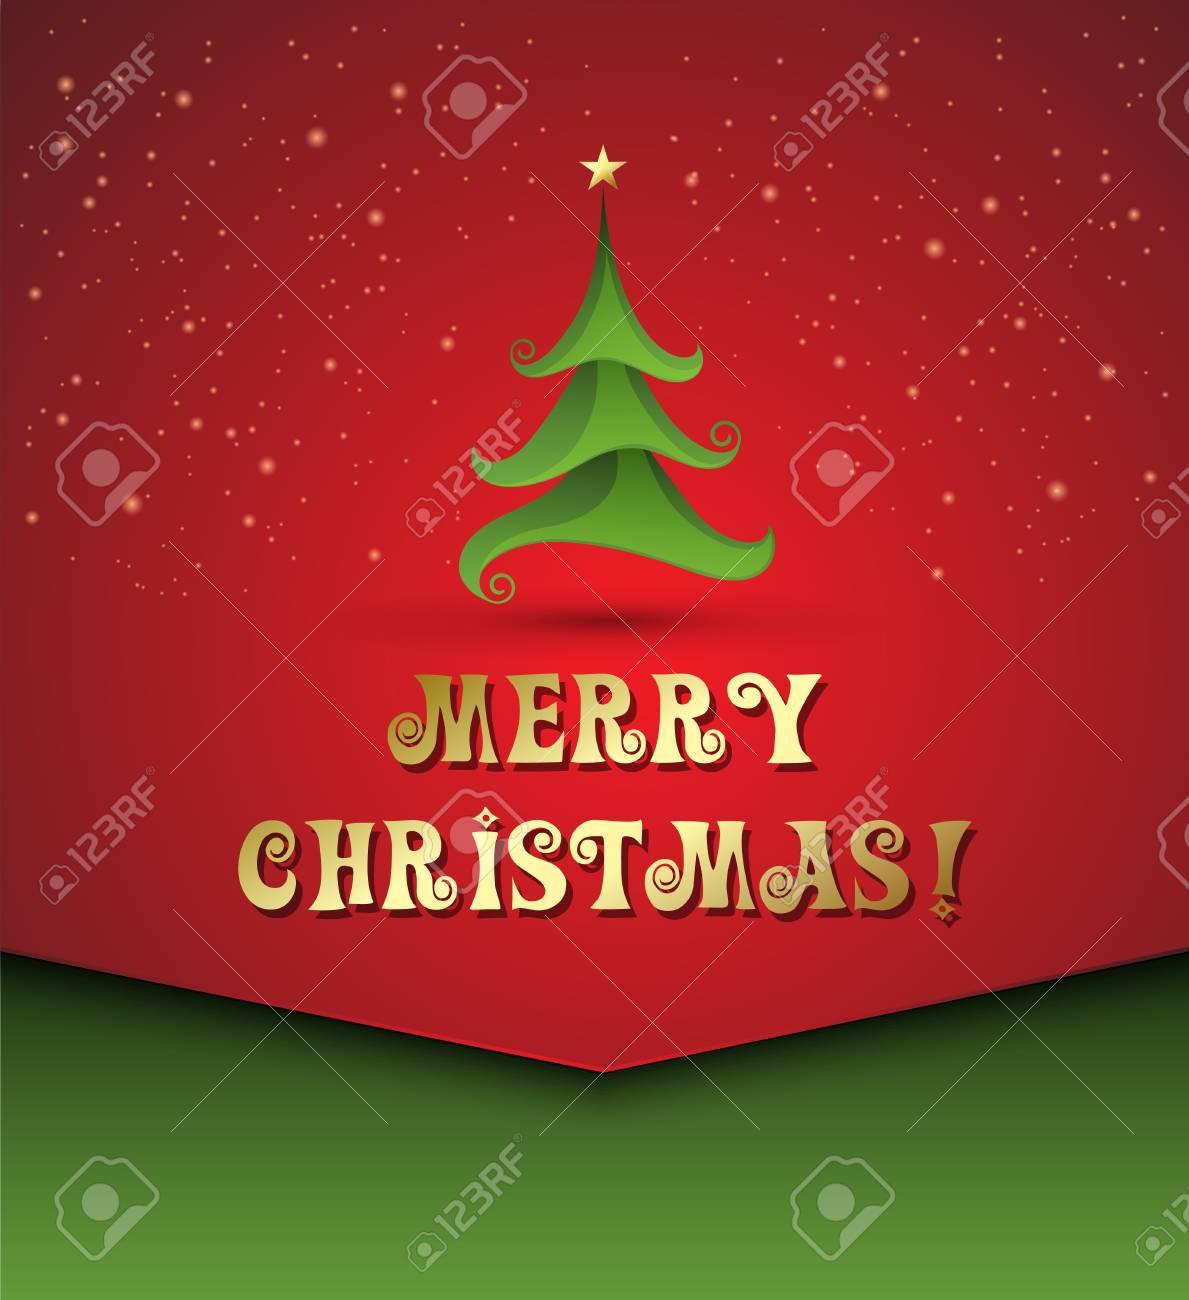 Vector illustration Christmas tree background Stock Vector - 21873235